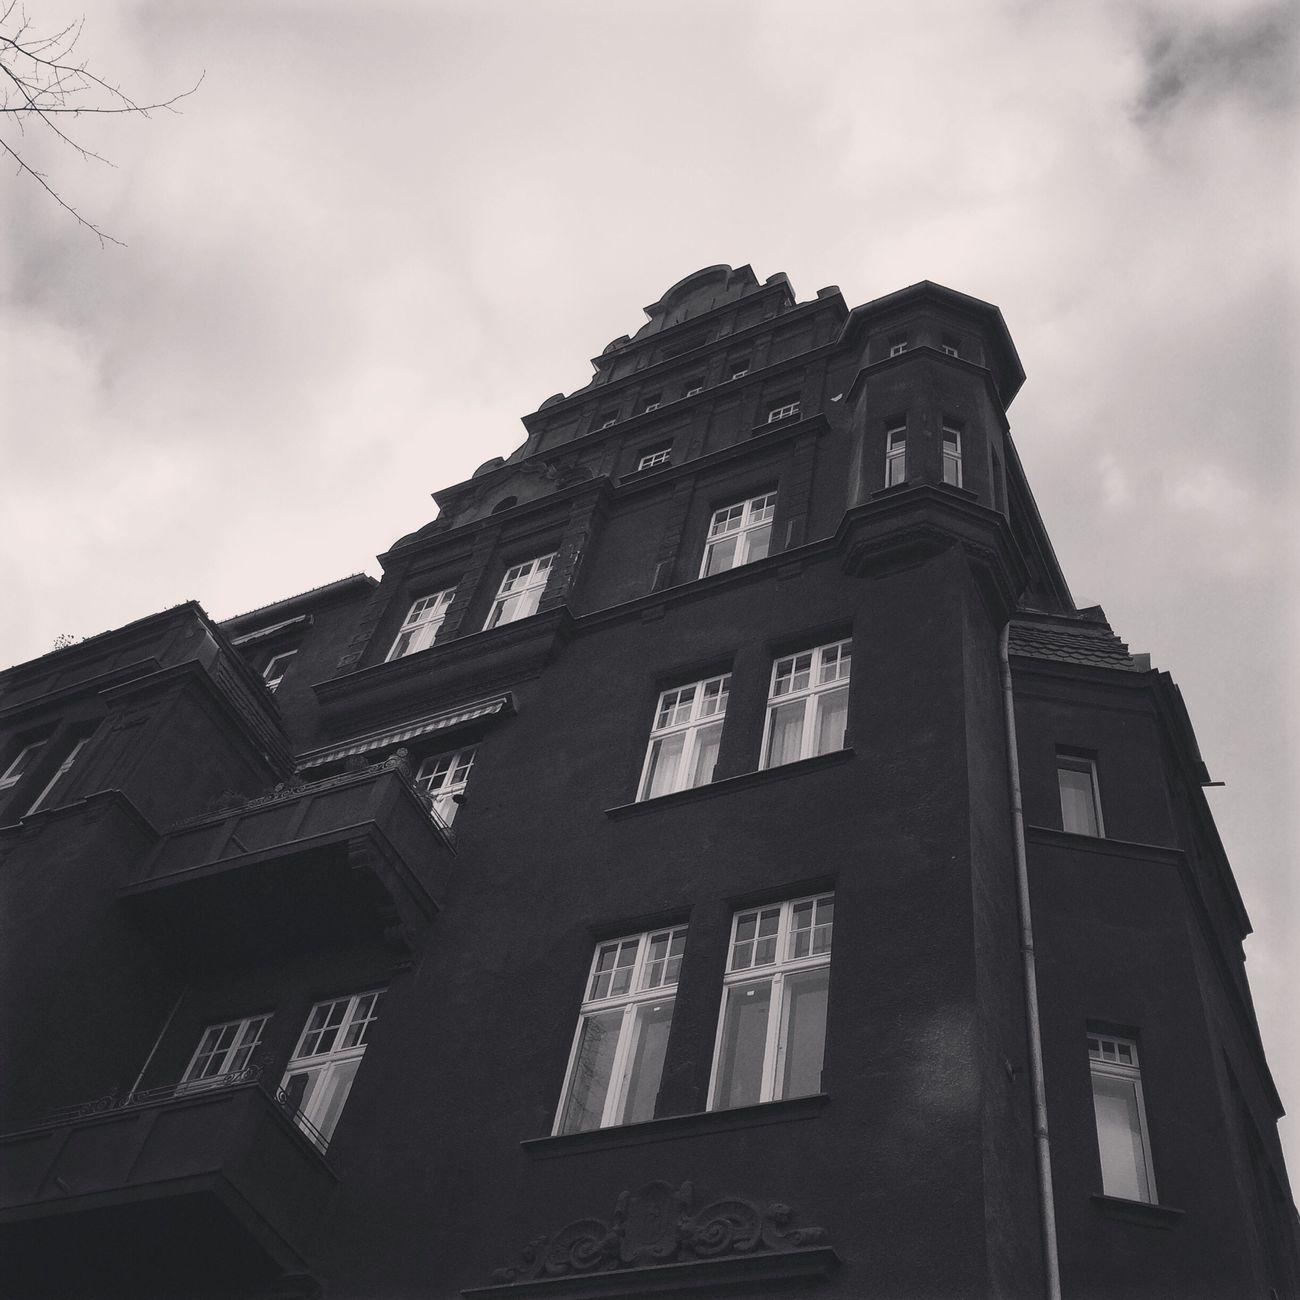 Schöneberg Spooky House B&WPhoto Berlinschöneberg Berlinarchitecture Creepy House